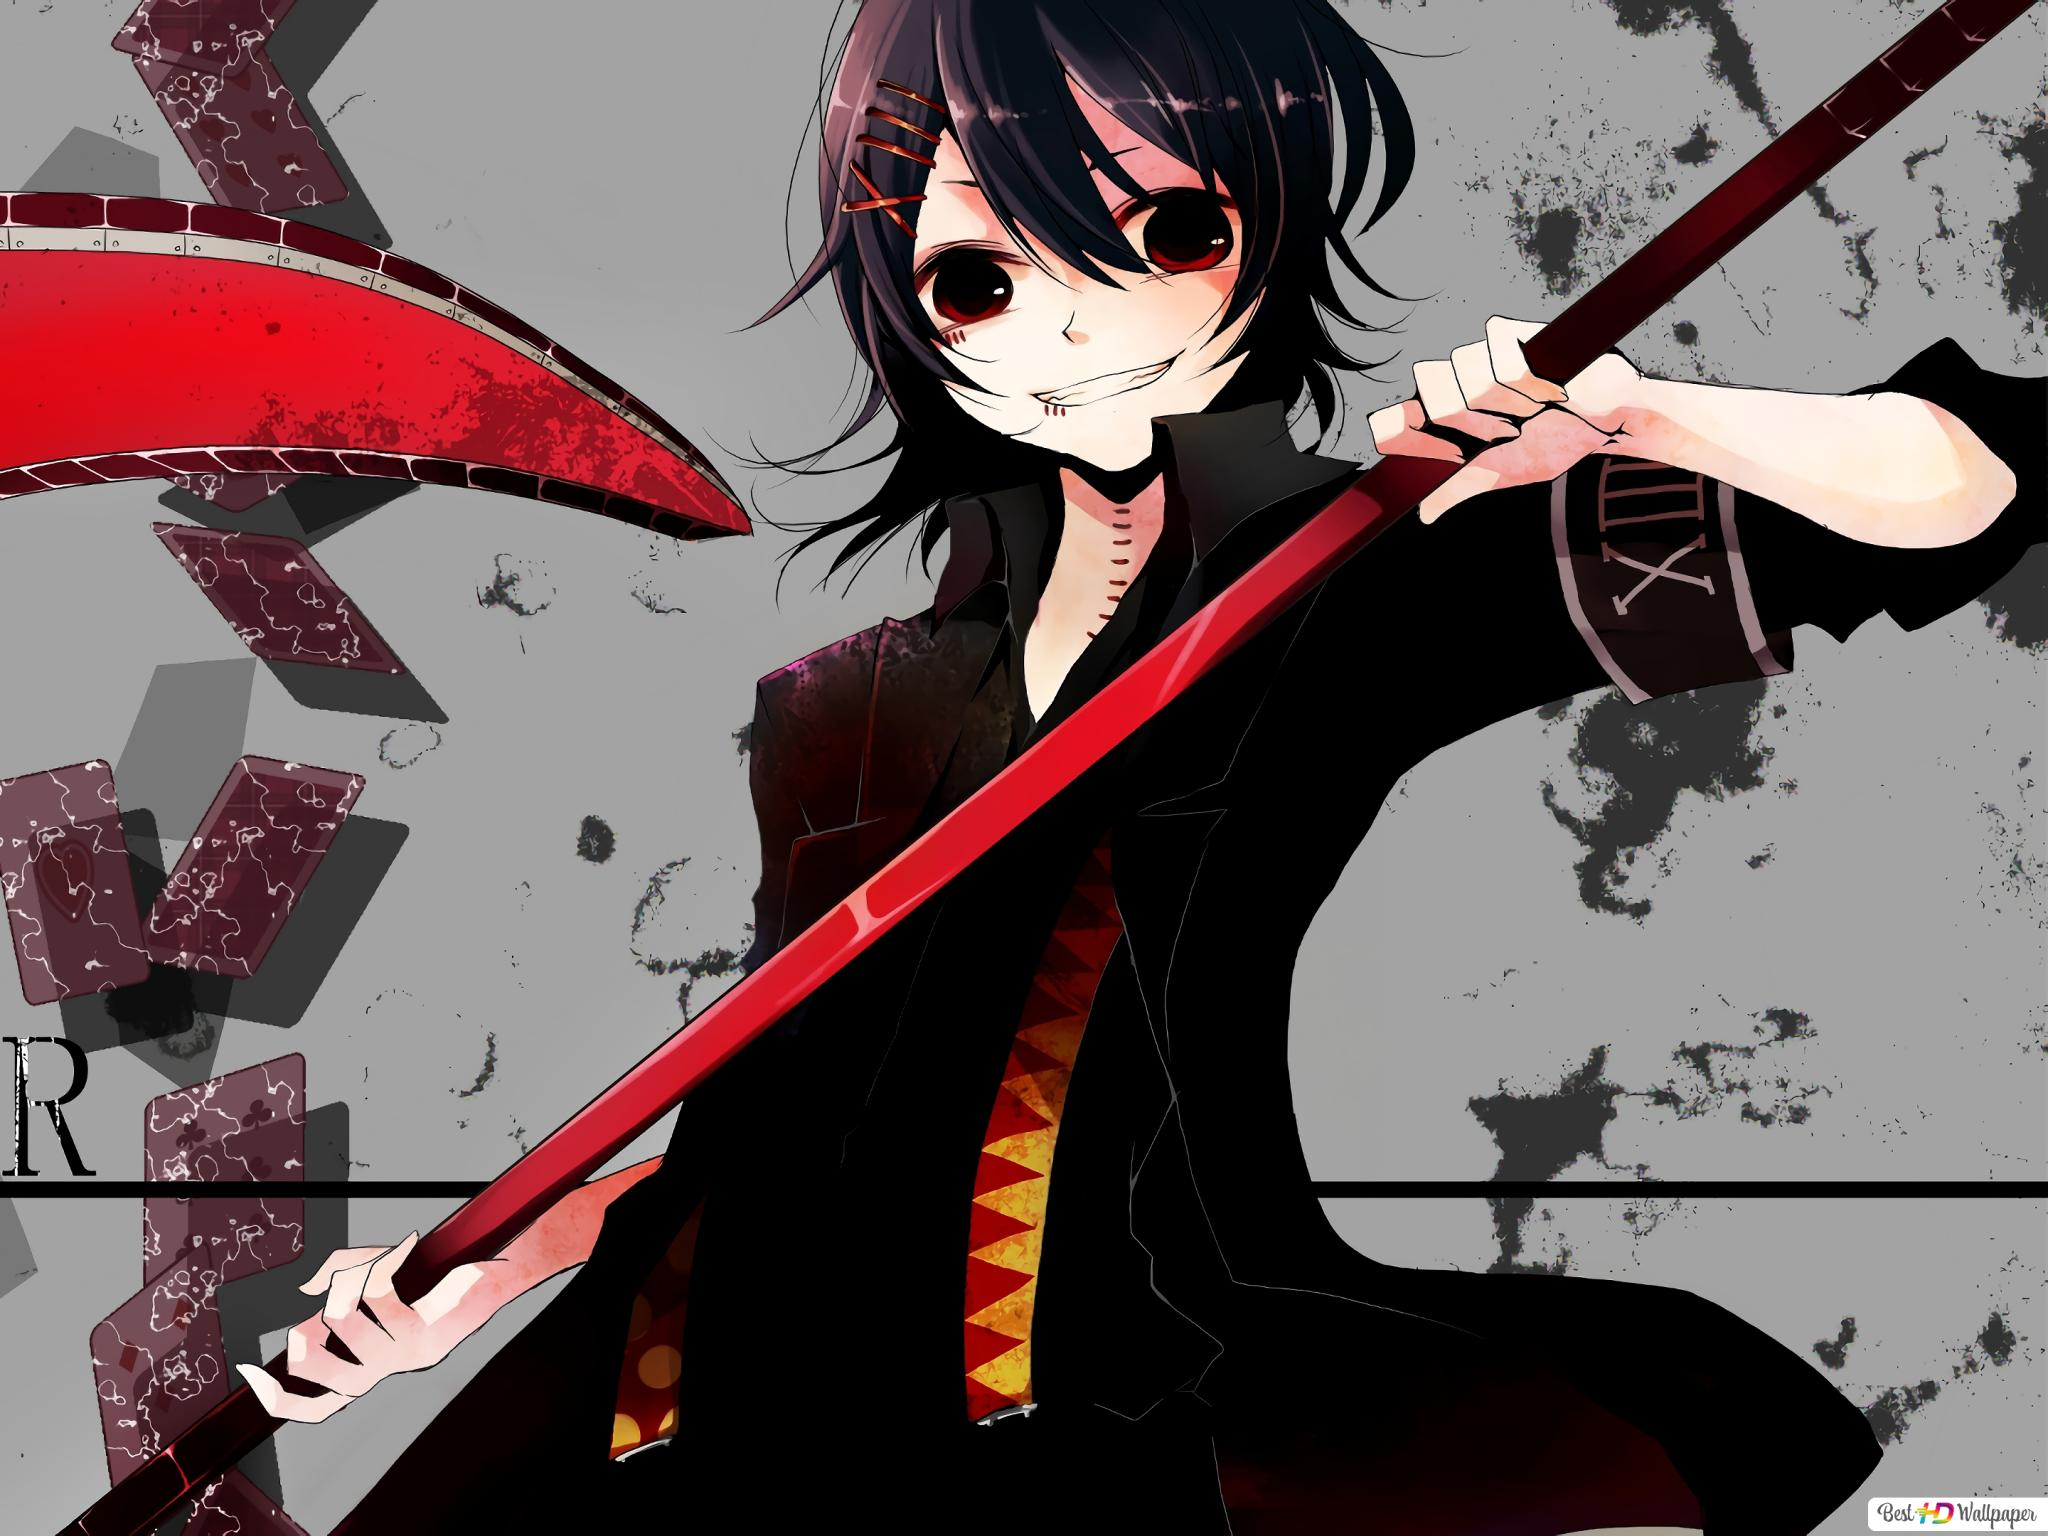 tokyo ghoul re juuzou suzuya joker scyth wallpaper 2048x1536 9806 26